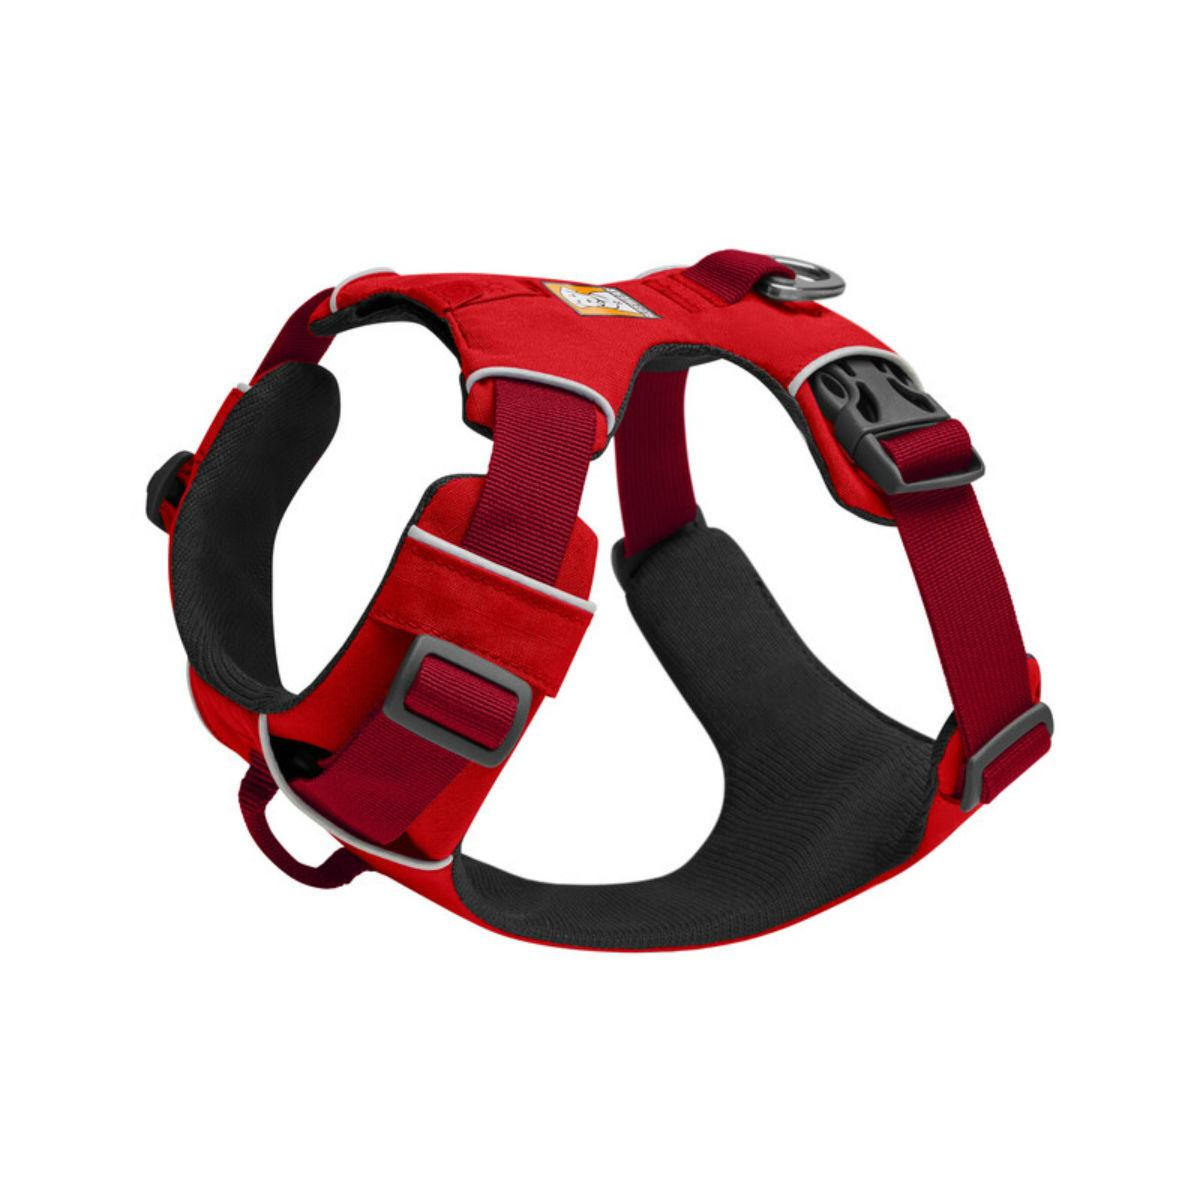 Front Range Dog Harness by RuffWear - Red Sumac